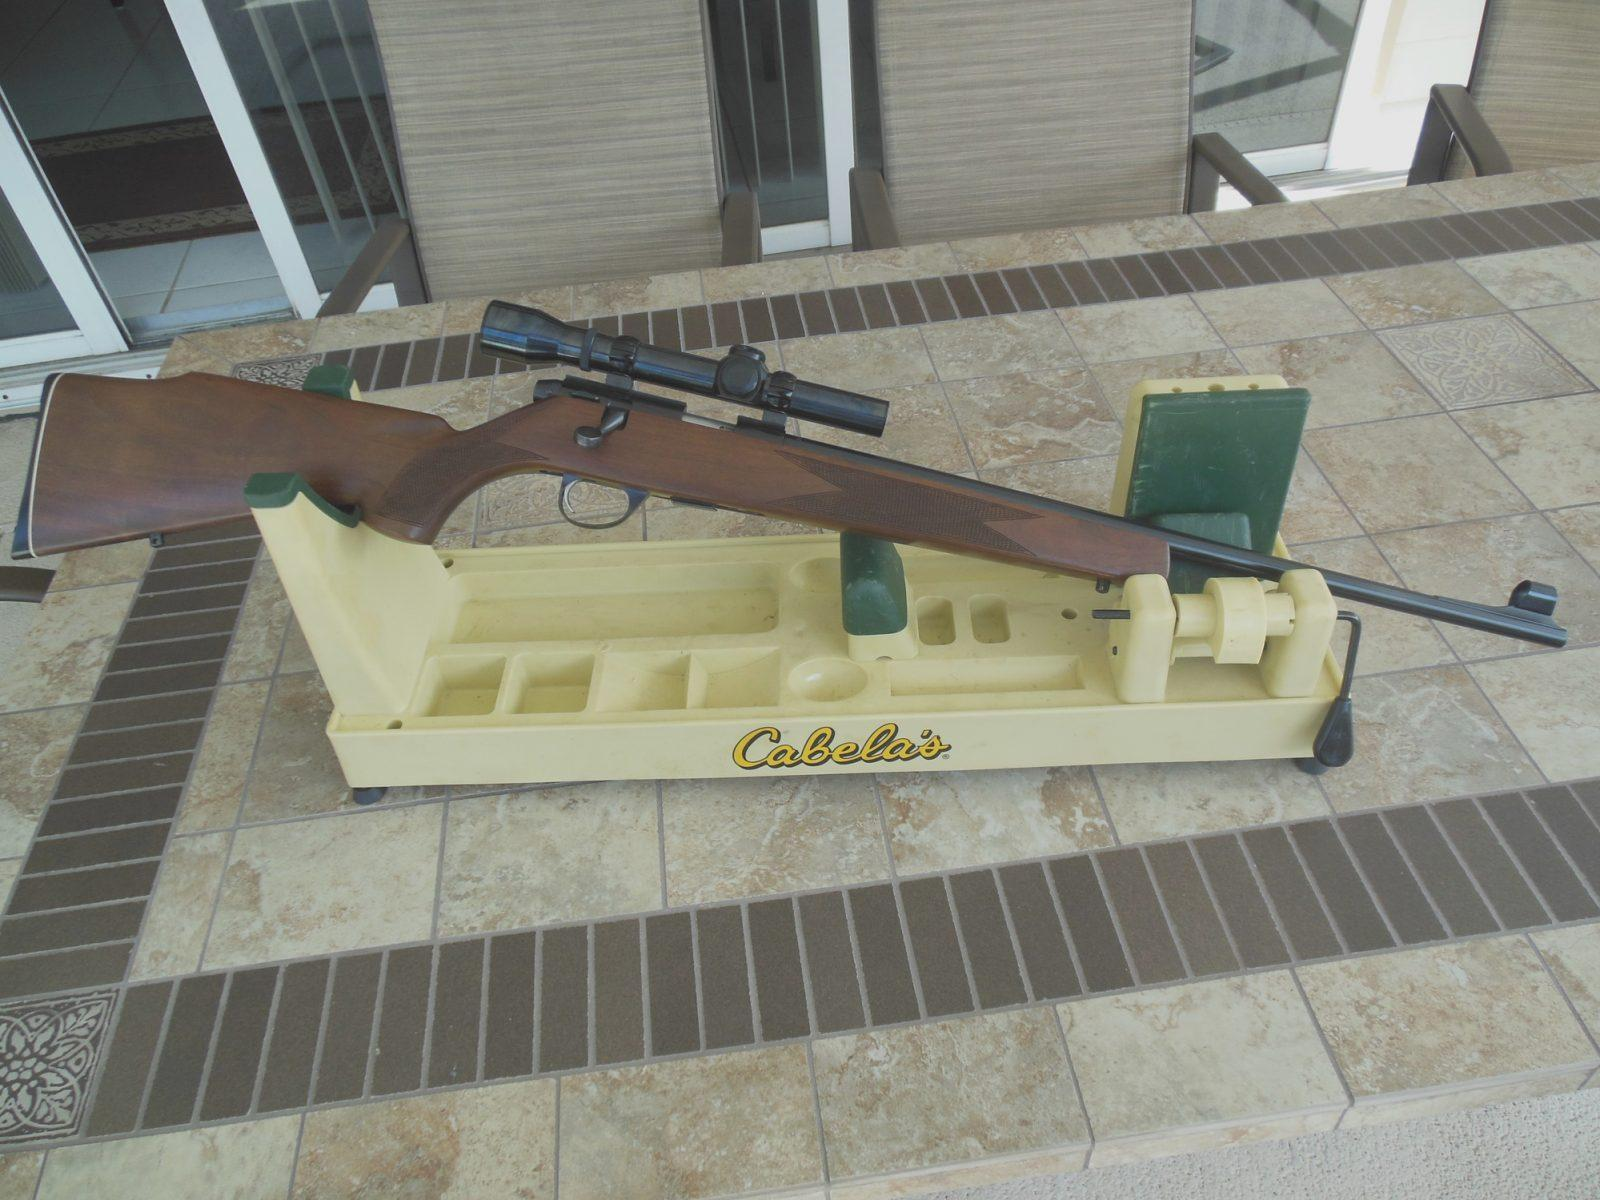 Sako P72 with scope mounted